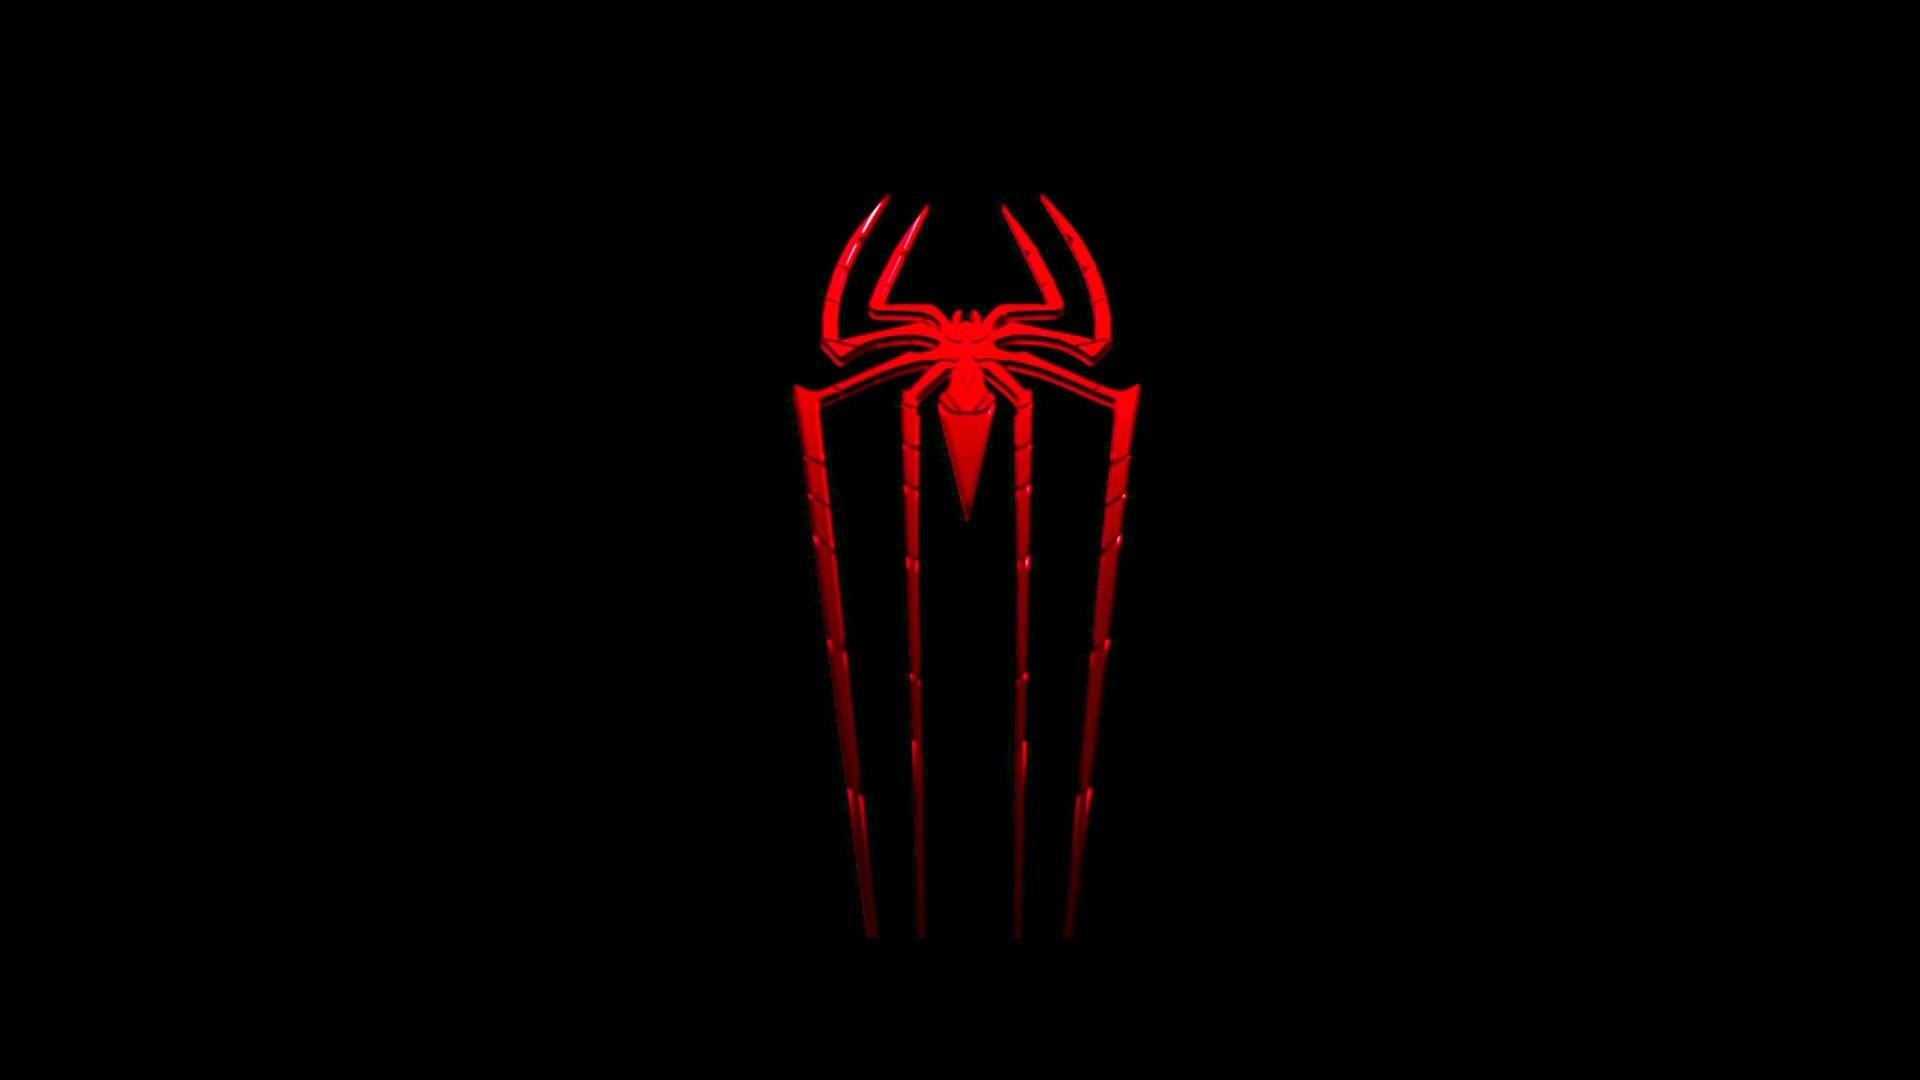 The Amazing Spider Man HD Wallpapers Desktop Backgrounds The The Amazing Spider  Man 2 Wallpapers HD Wallpapers)